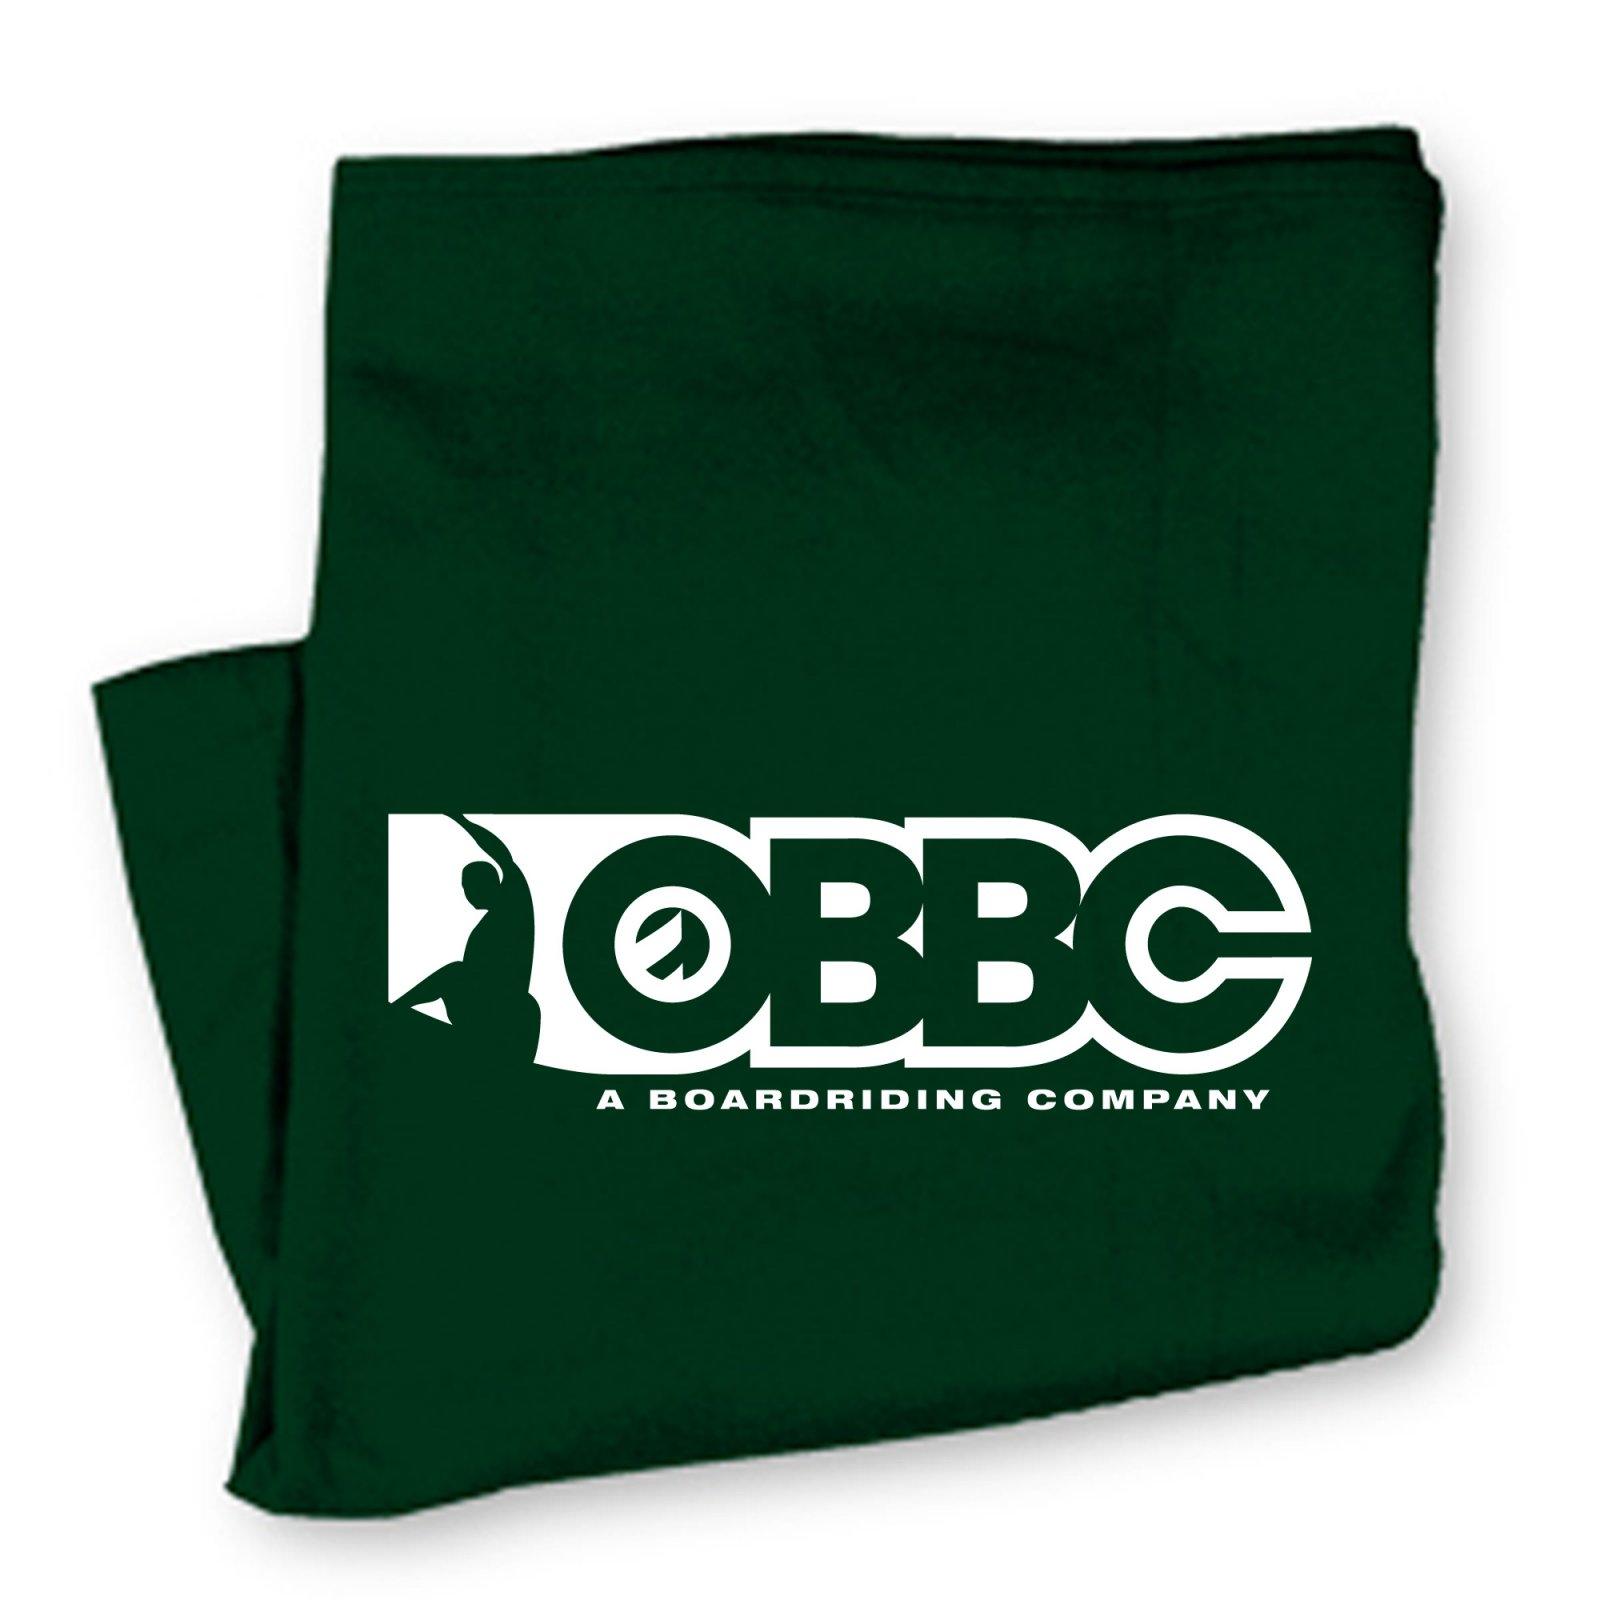 OBBC Beach Blanket Forest Green